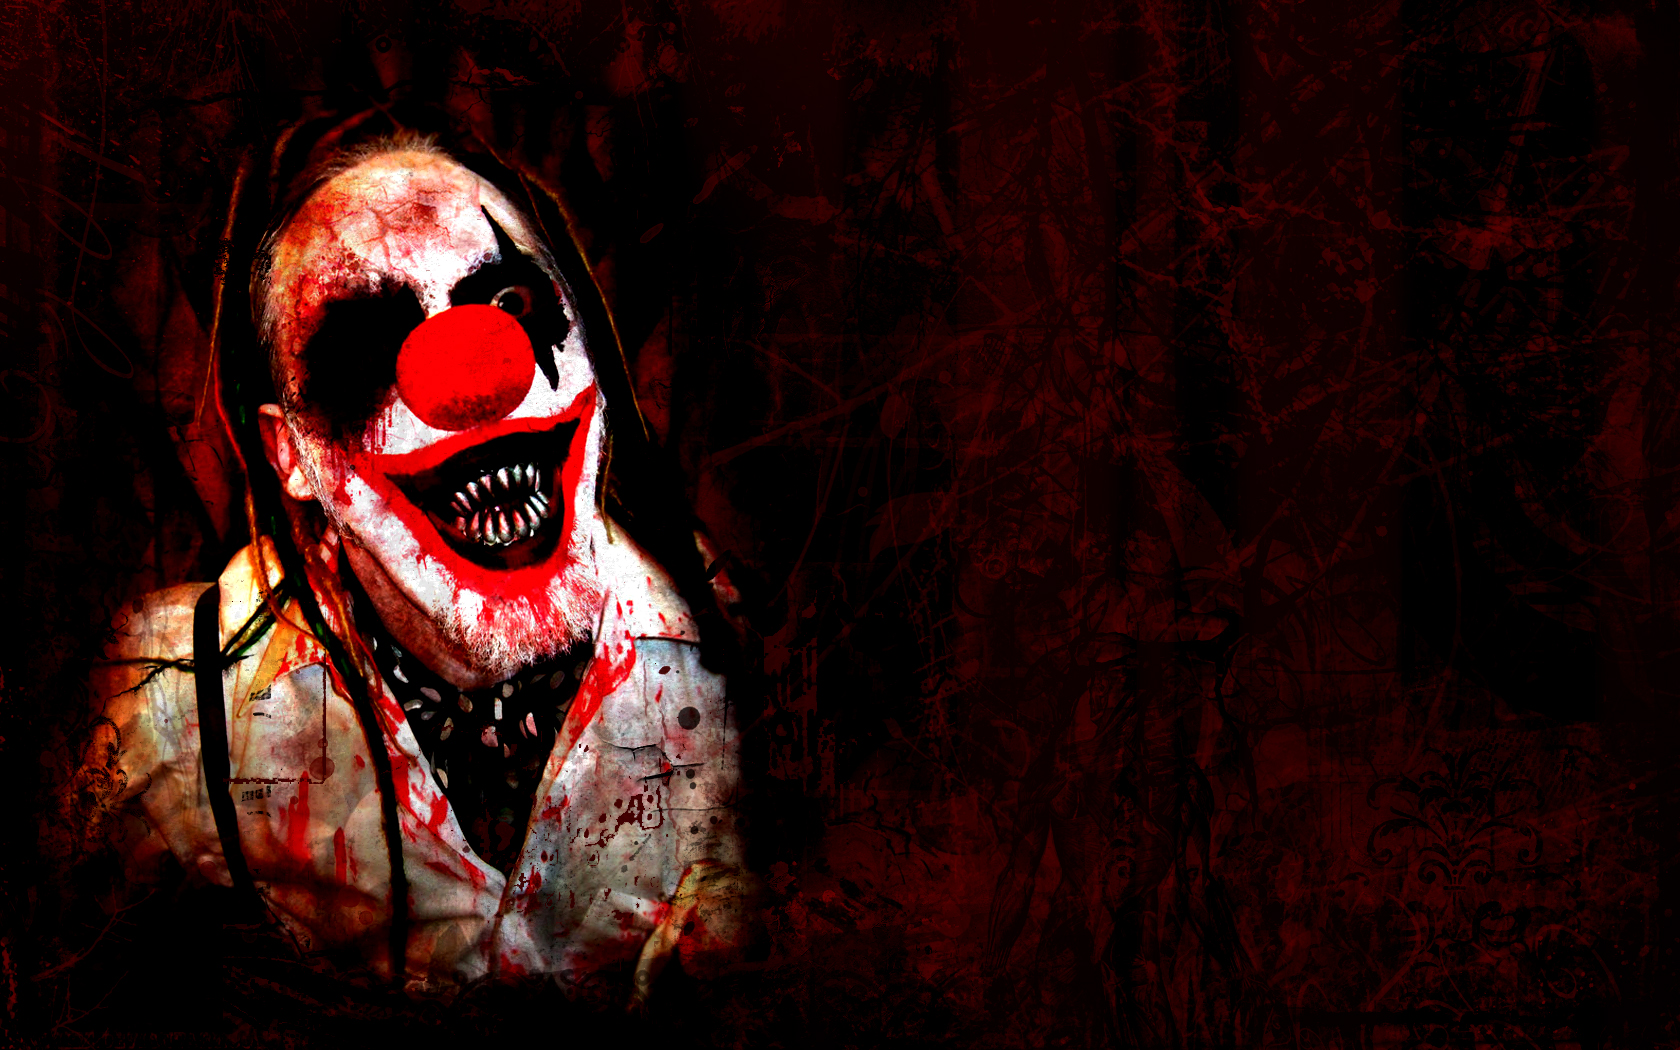 Killer_Clown_Wallpaper_by_catamite.jpg